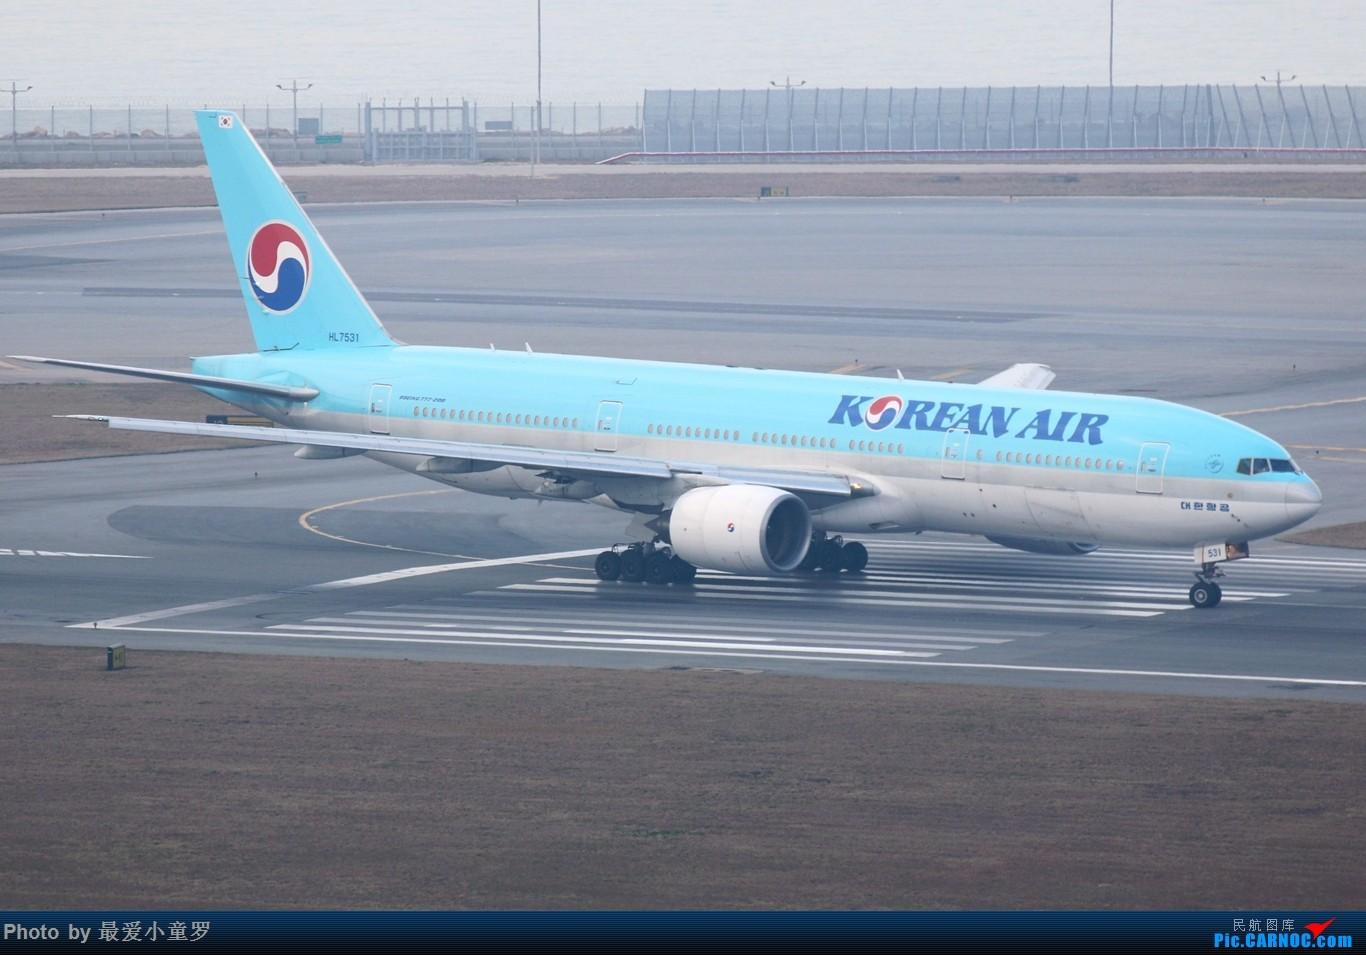 Re:[原创]2015年1月25日香港沙螺湾烂天拍机第二集——波音777 BOEING 777-200ER HL7531